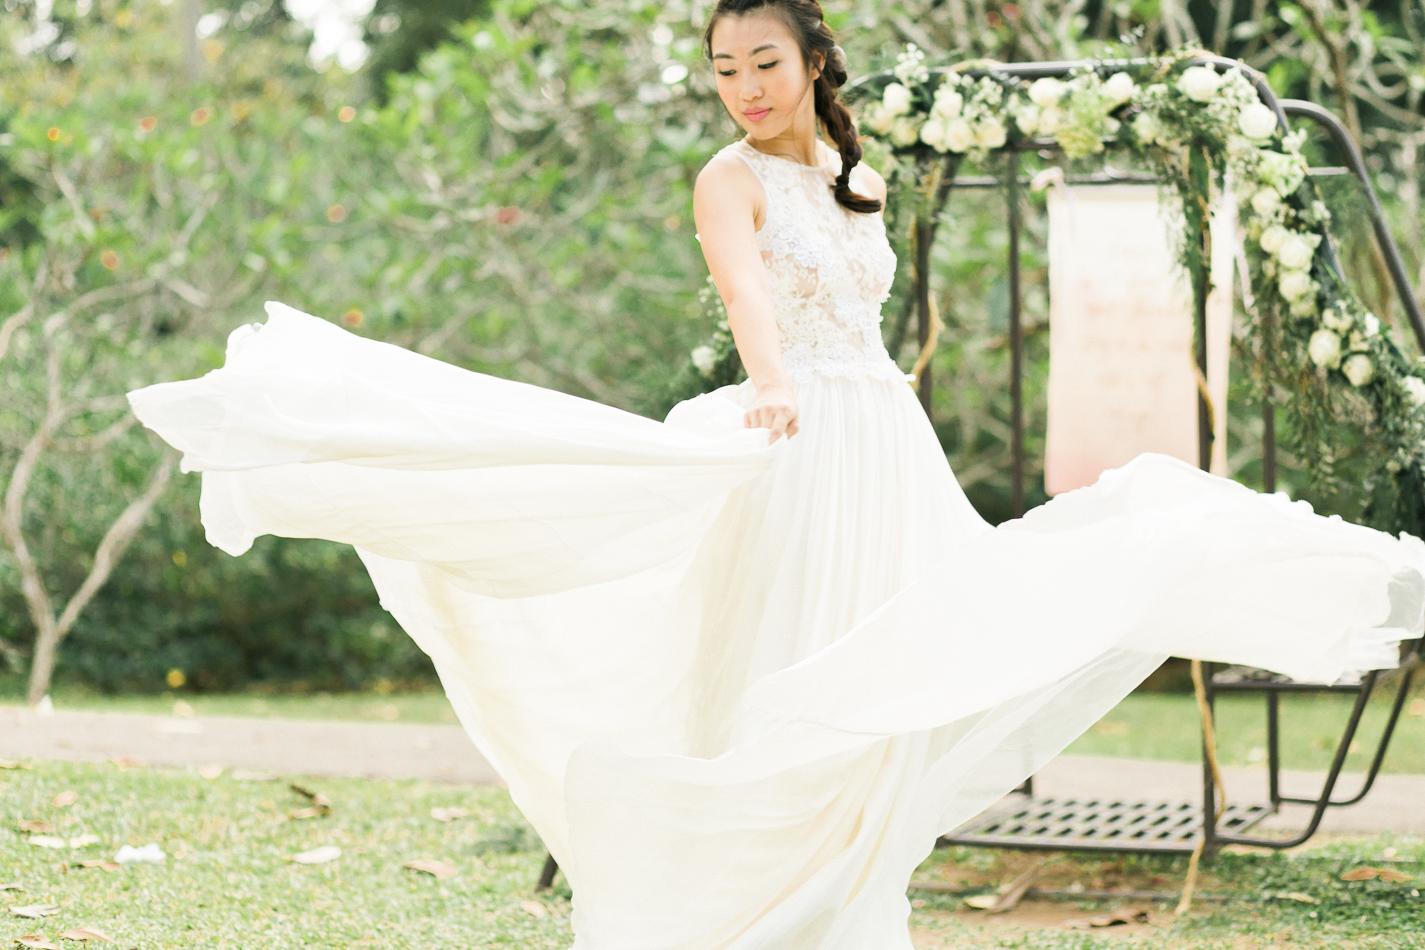 chen sands photography the wedding scoop bridal workshop caroline tran botanic gardens.jpg-3.jpg